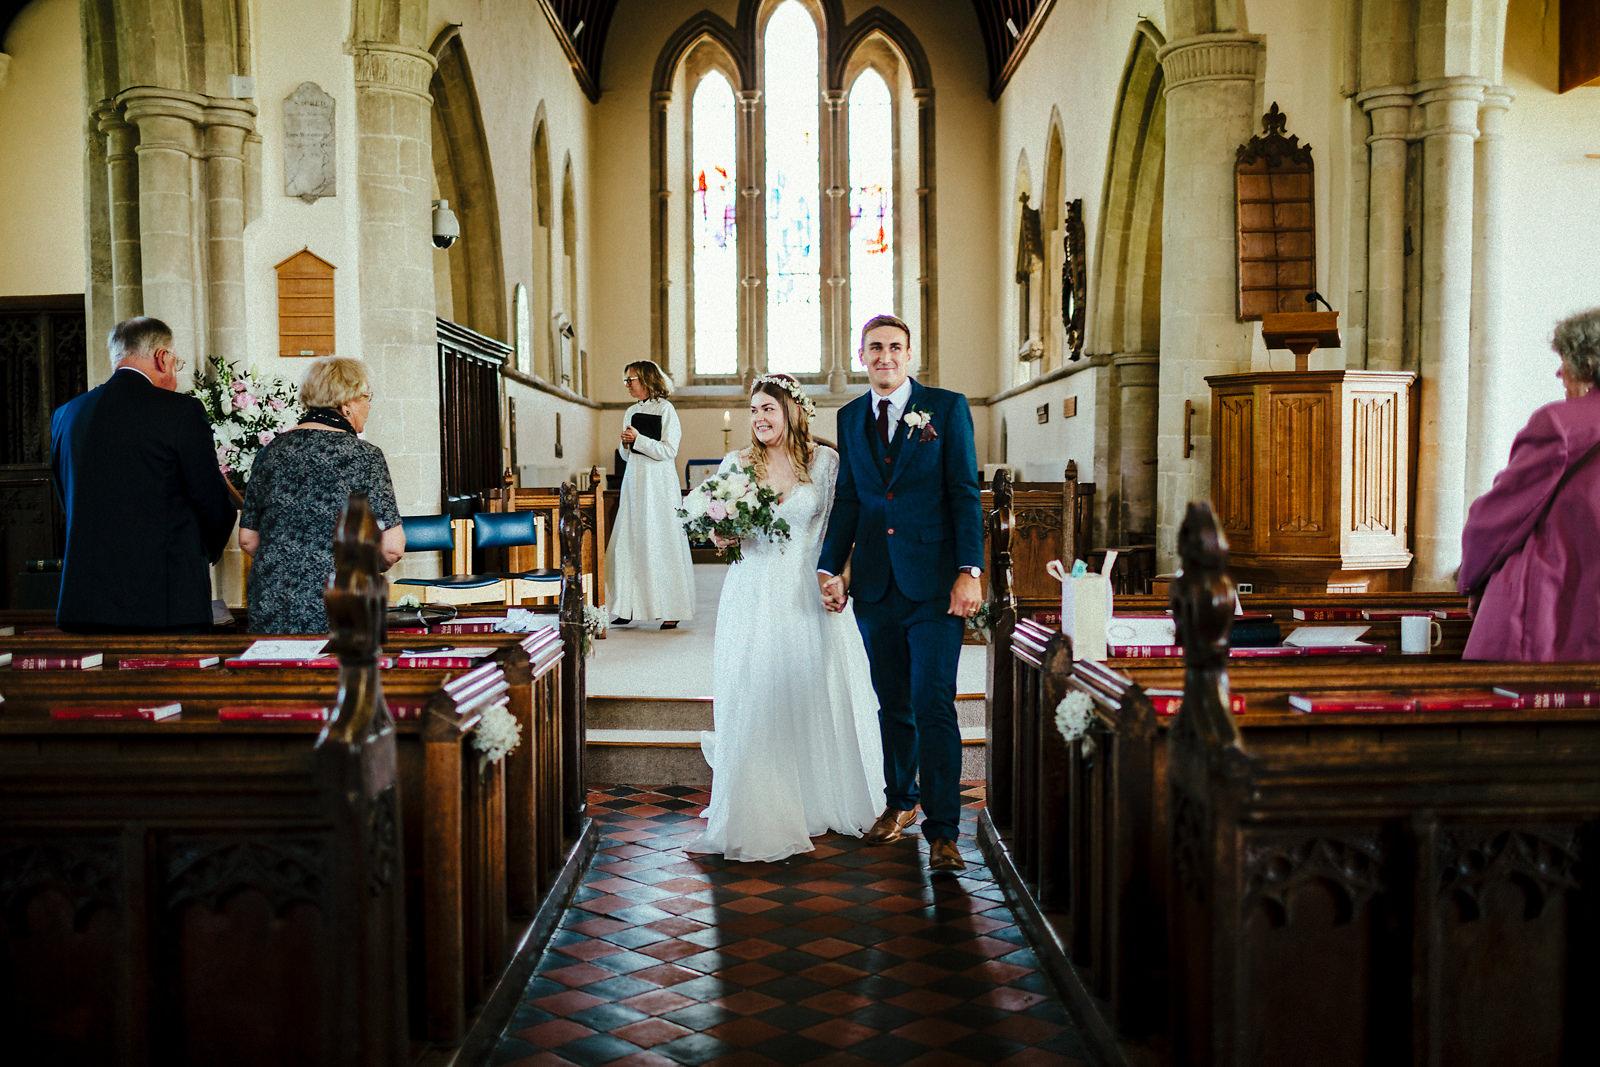 Wedding exit at Haddenham church